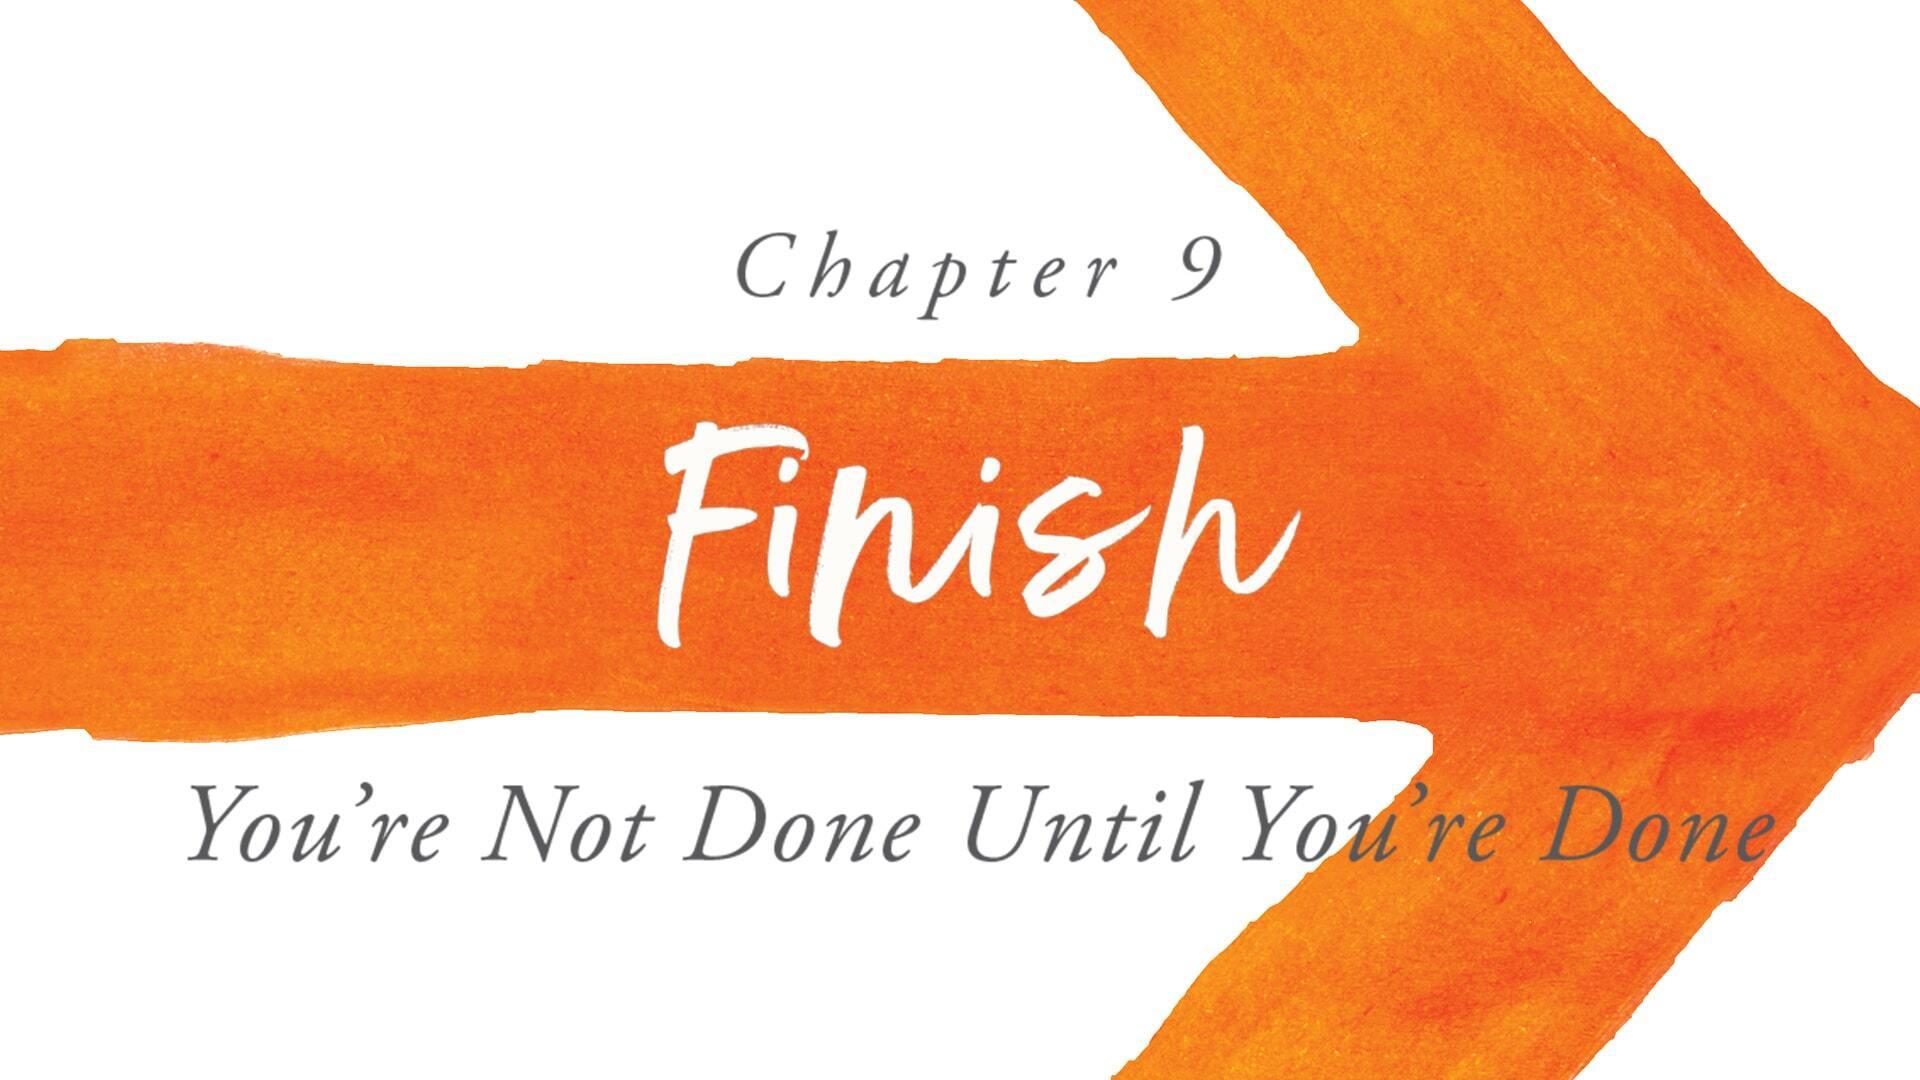 Forward Chapter 9: Finish